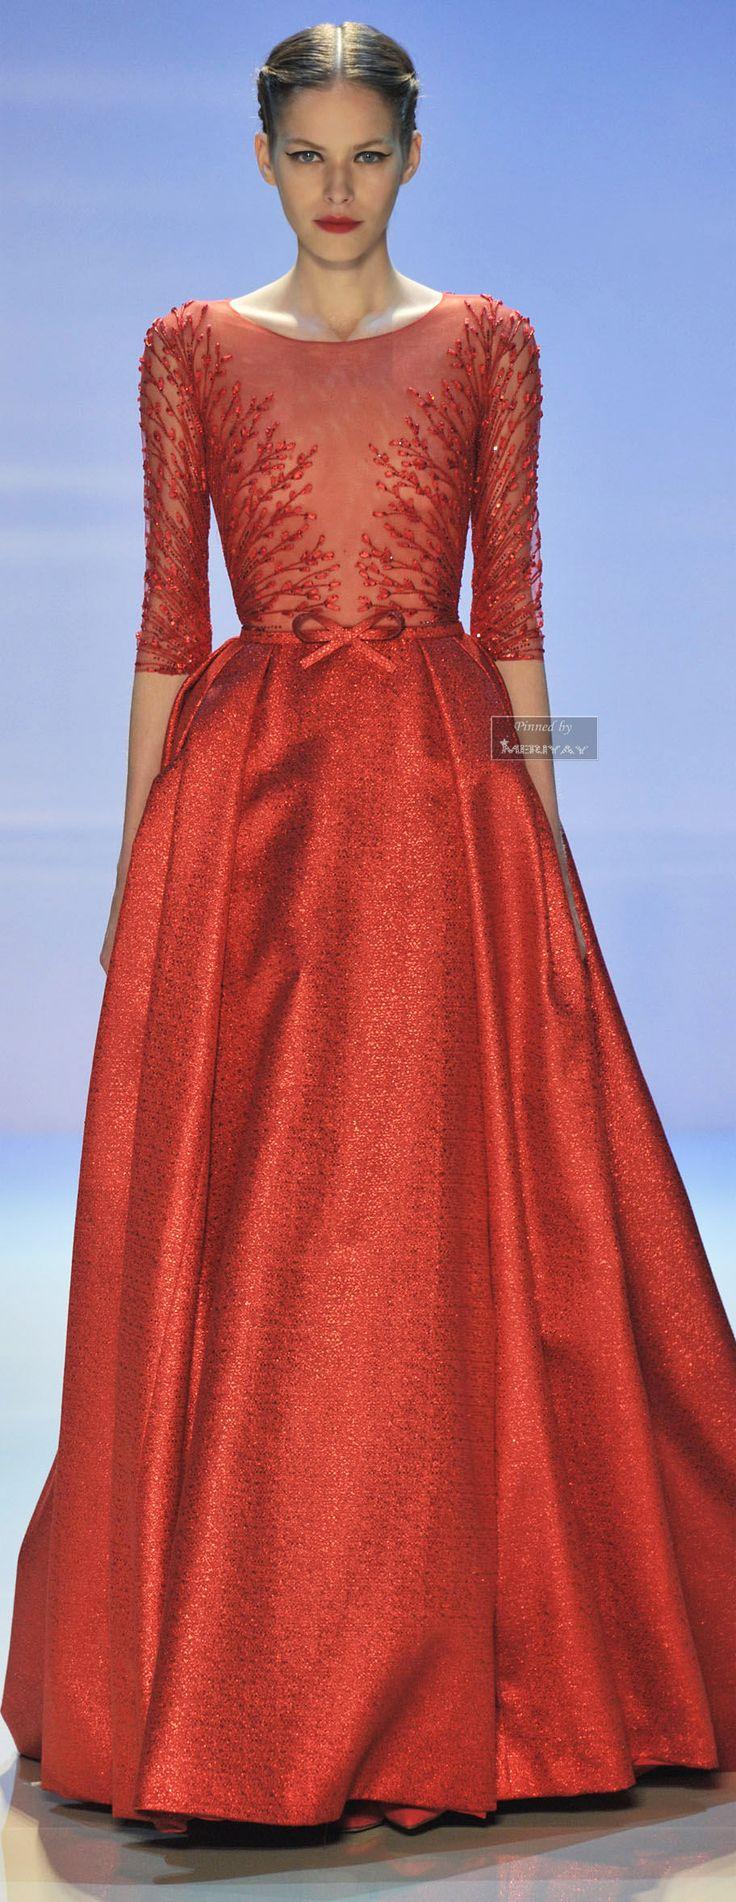 best dresses in red images on pinterest formal prom dresses